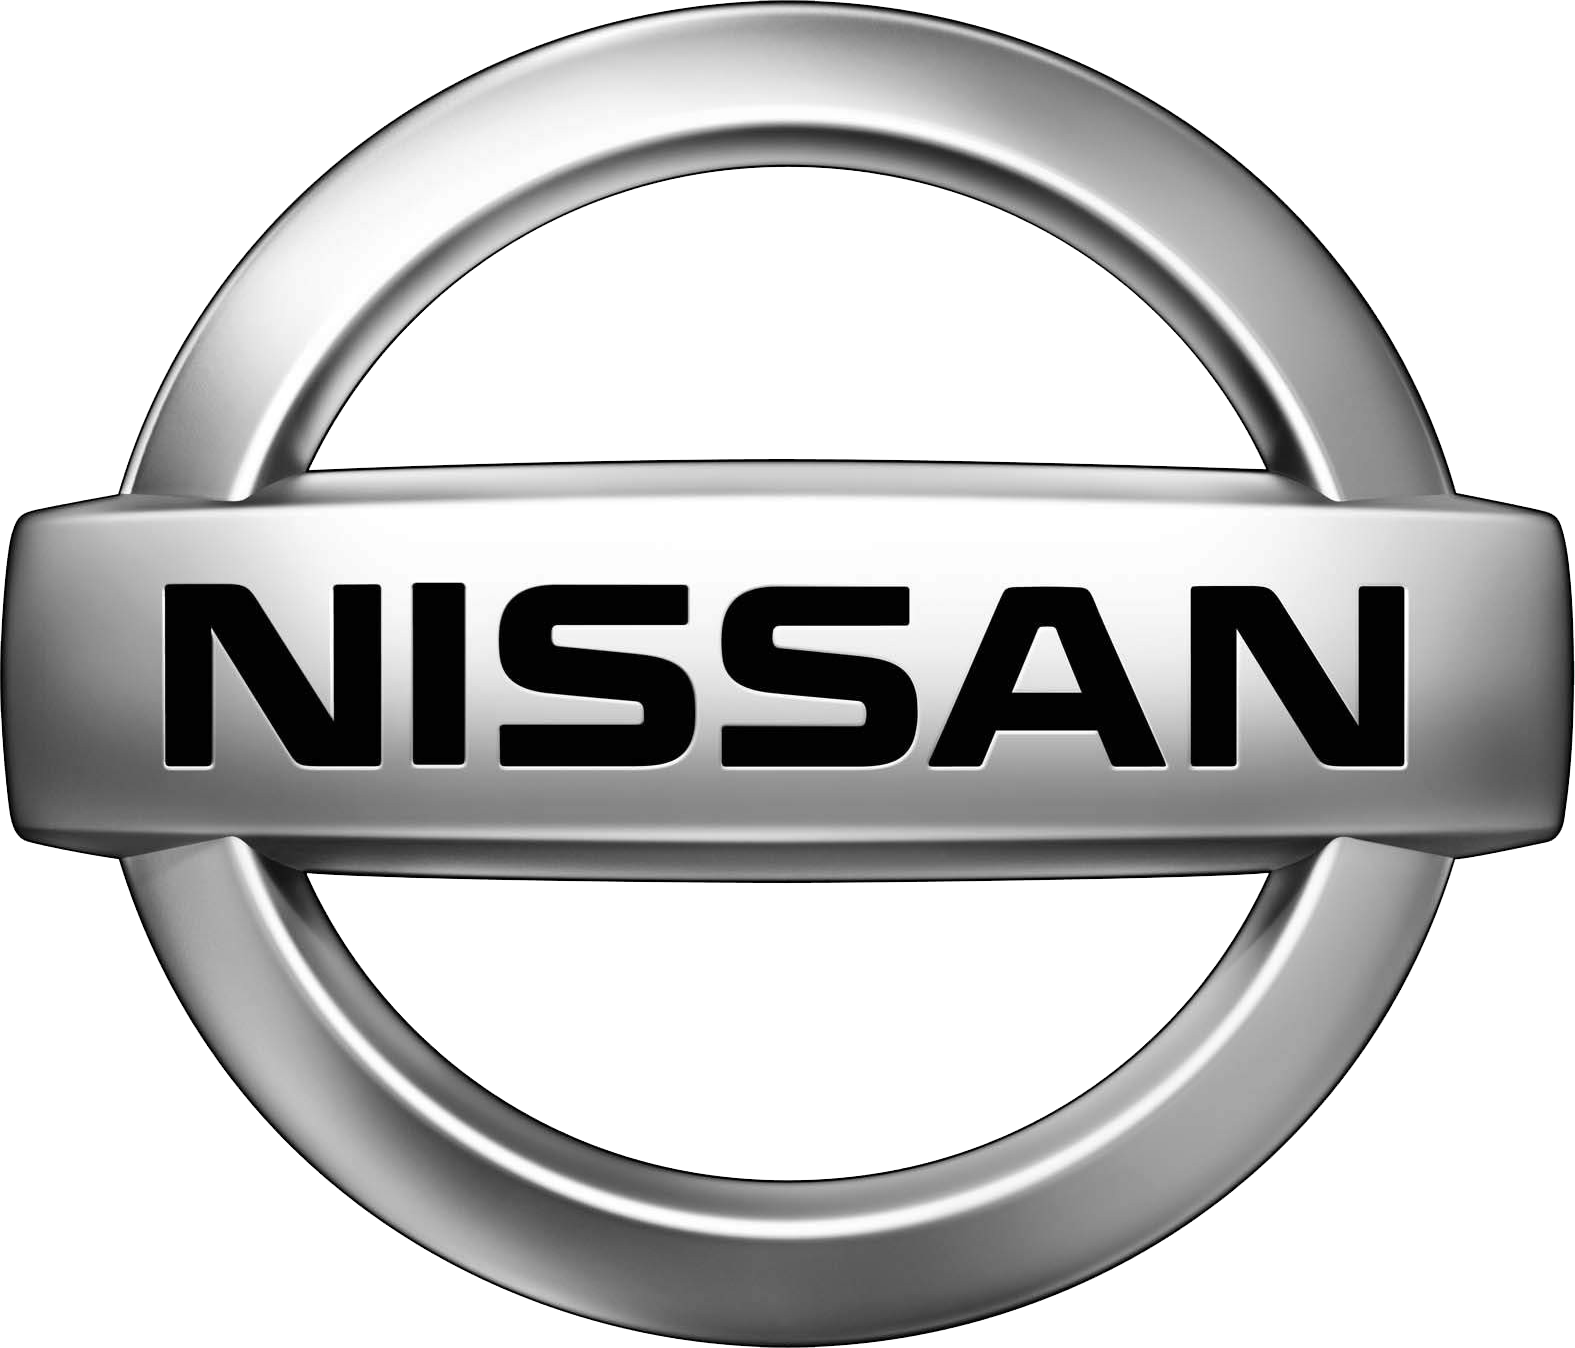 Nissan Car Logo Png Brand Image - Nissan, Transparent background PNG HD thumbnail